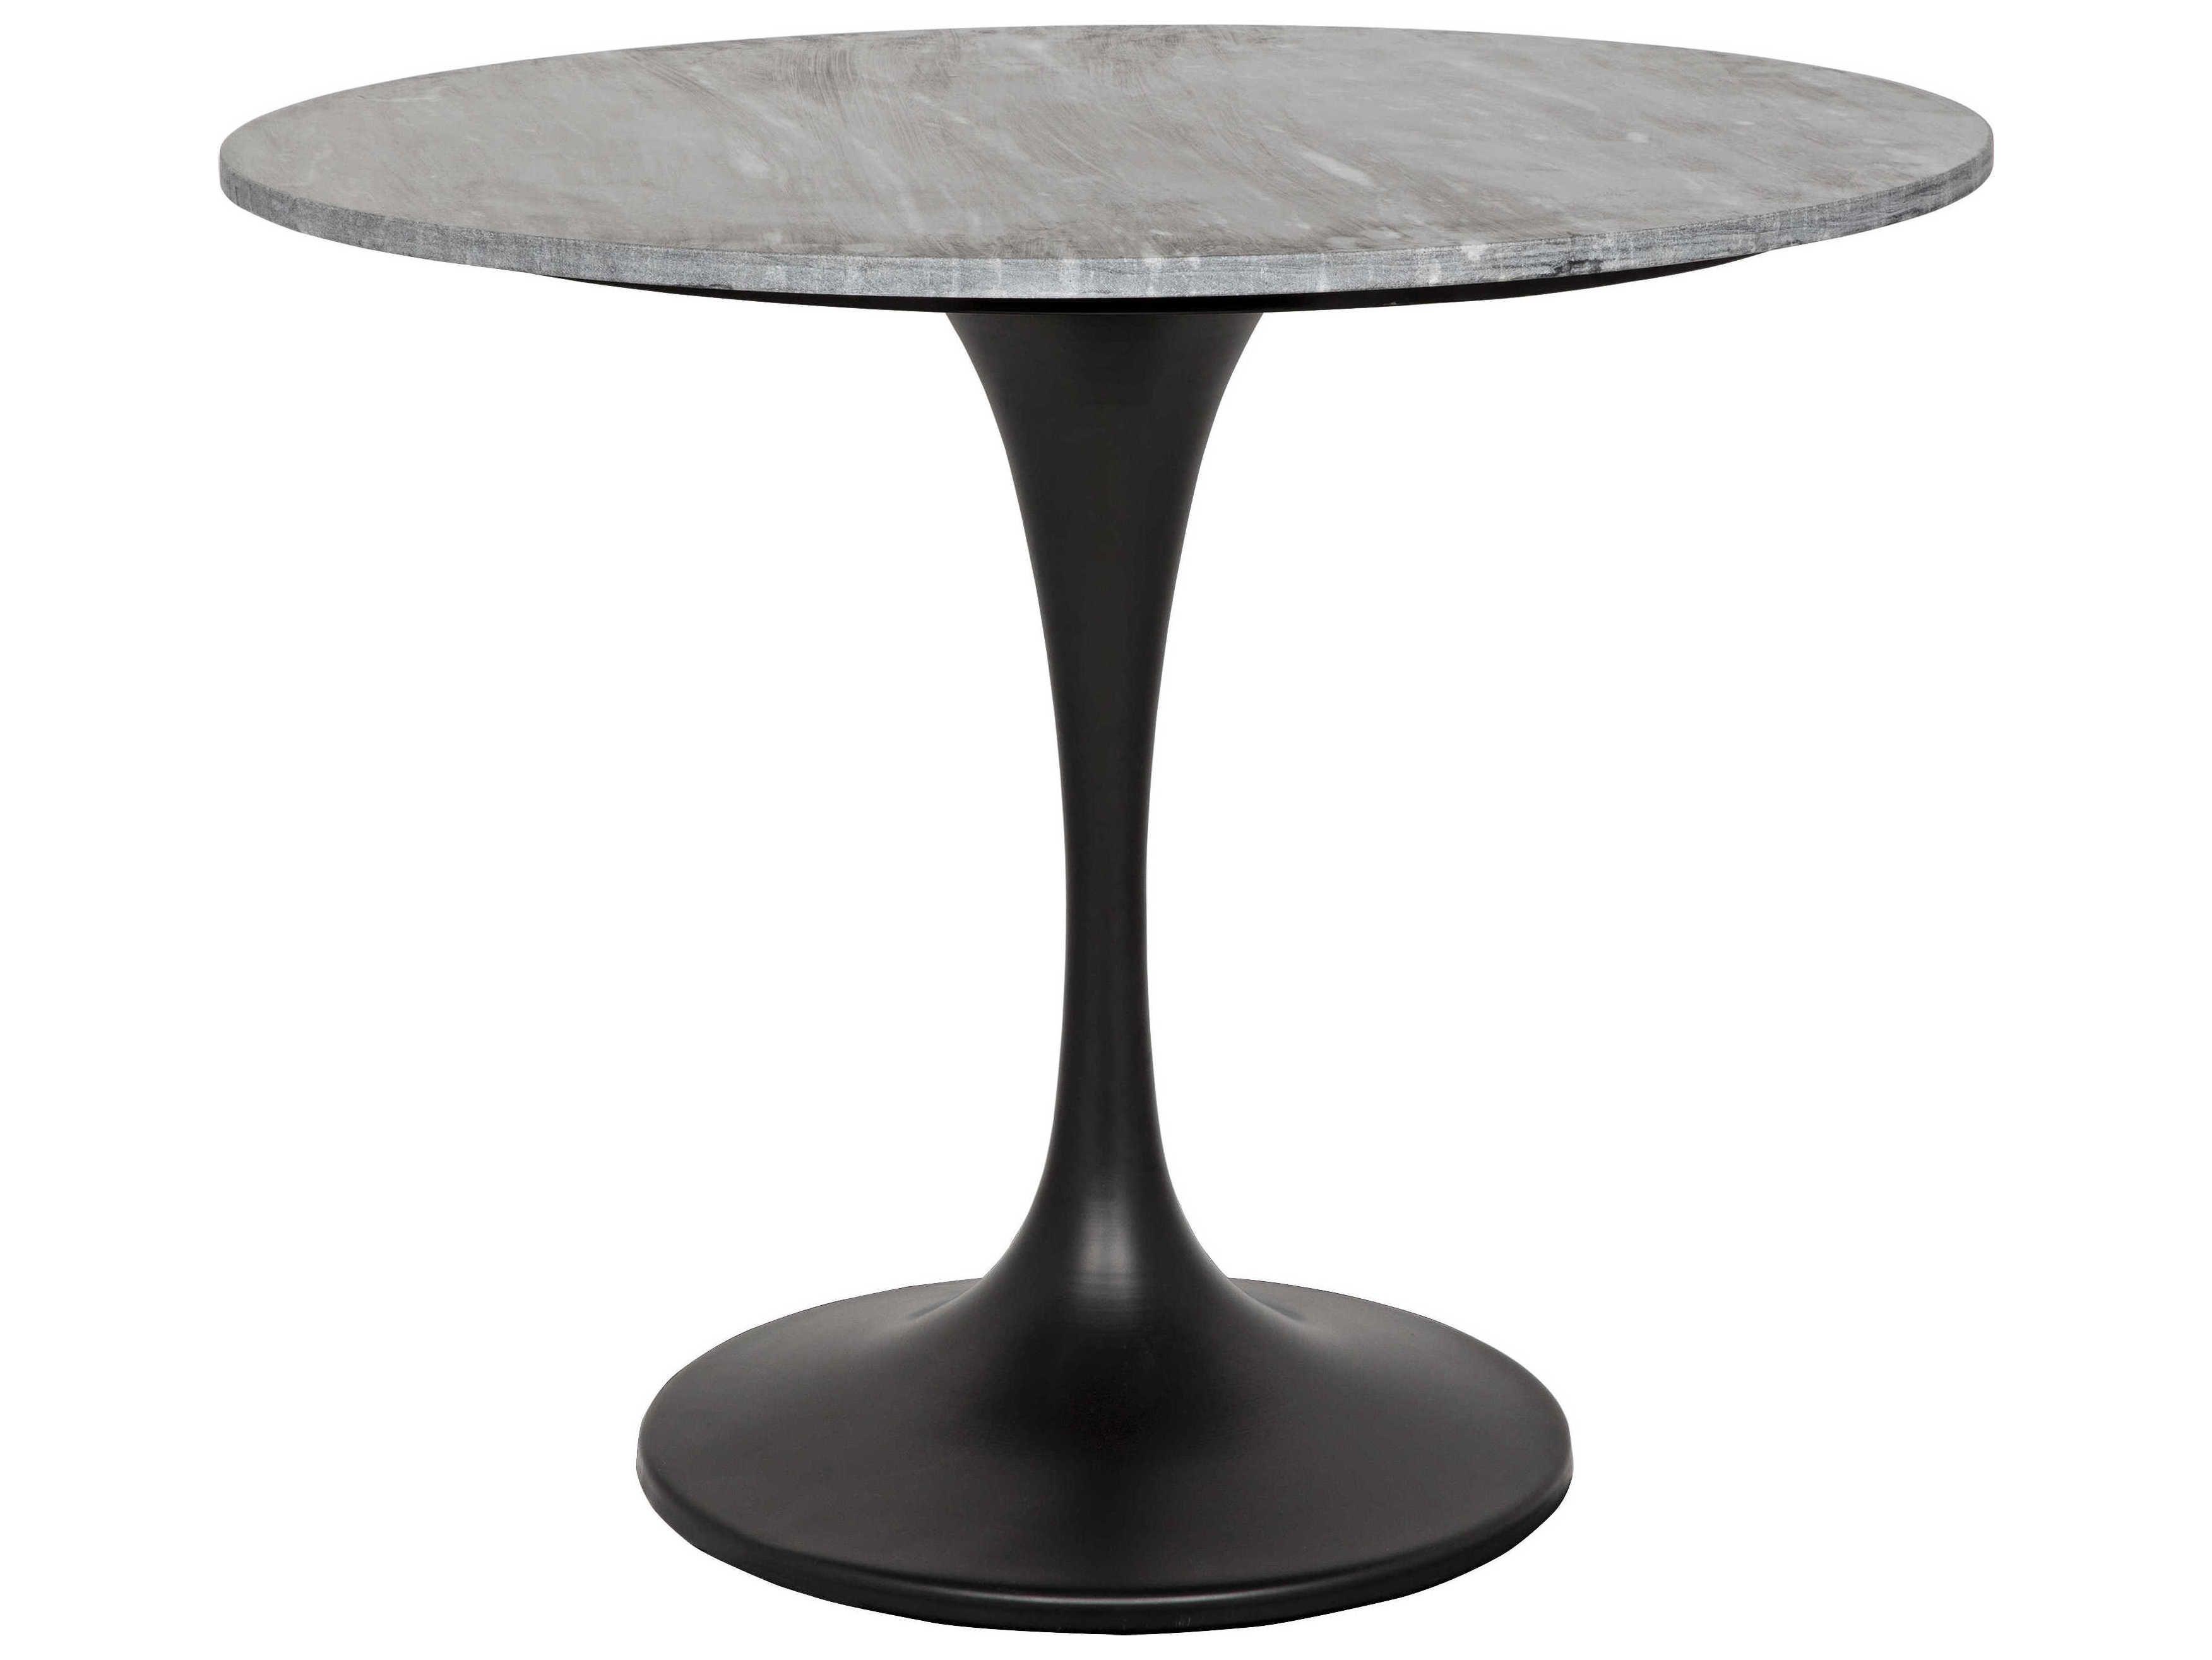 Noir Furniture Lighting Home Decor 36 Round Dining Table Round Dining Furniture Design Table